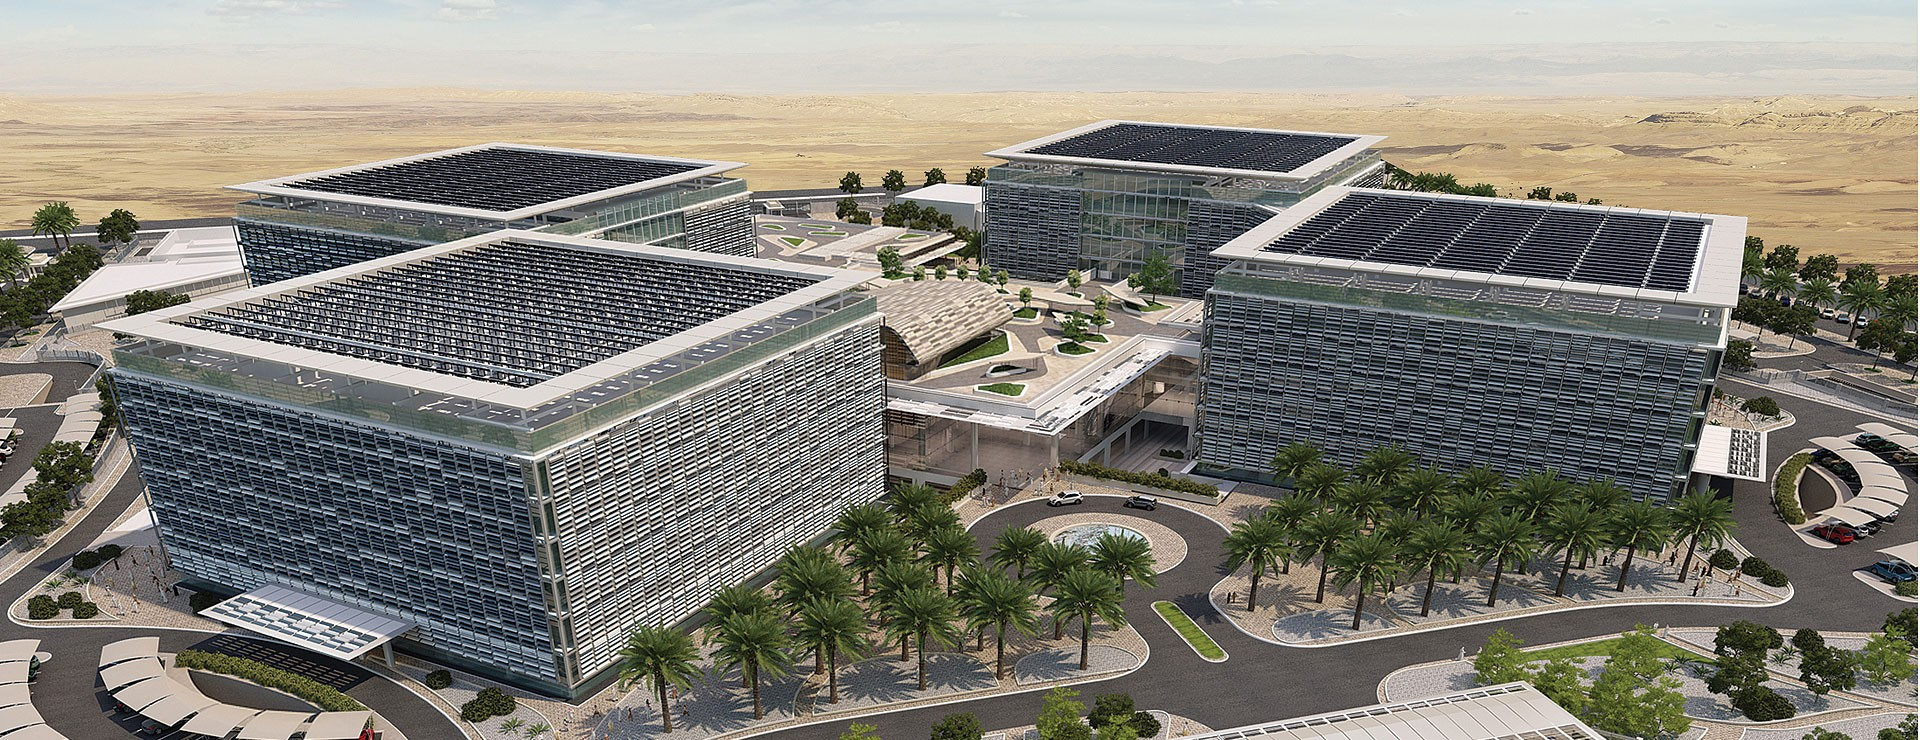 Saudi Electricity Company HQ